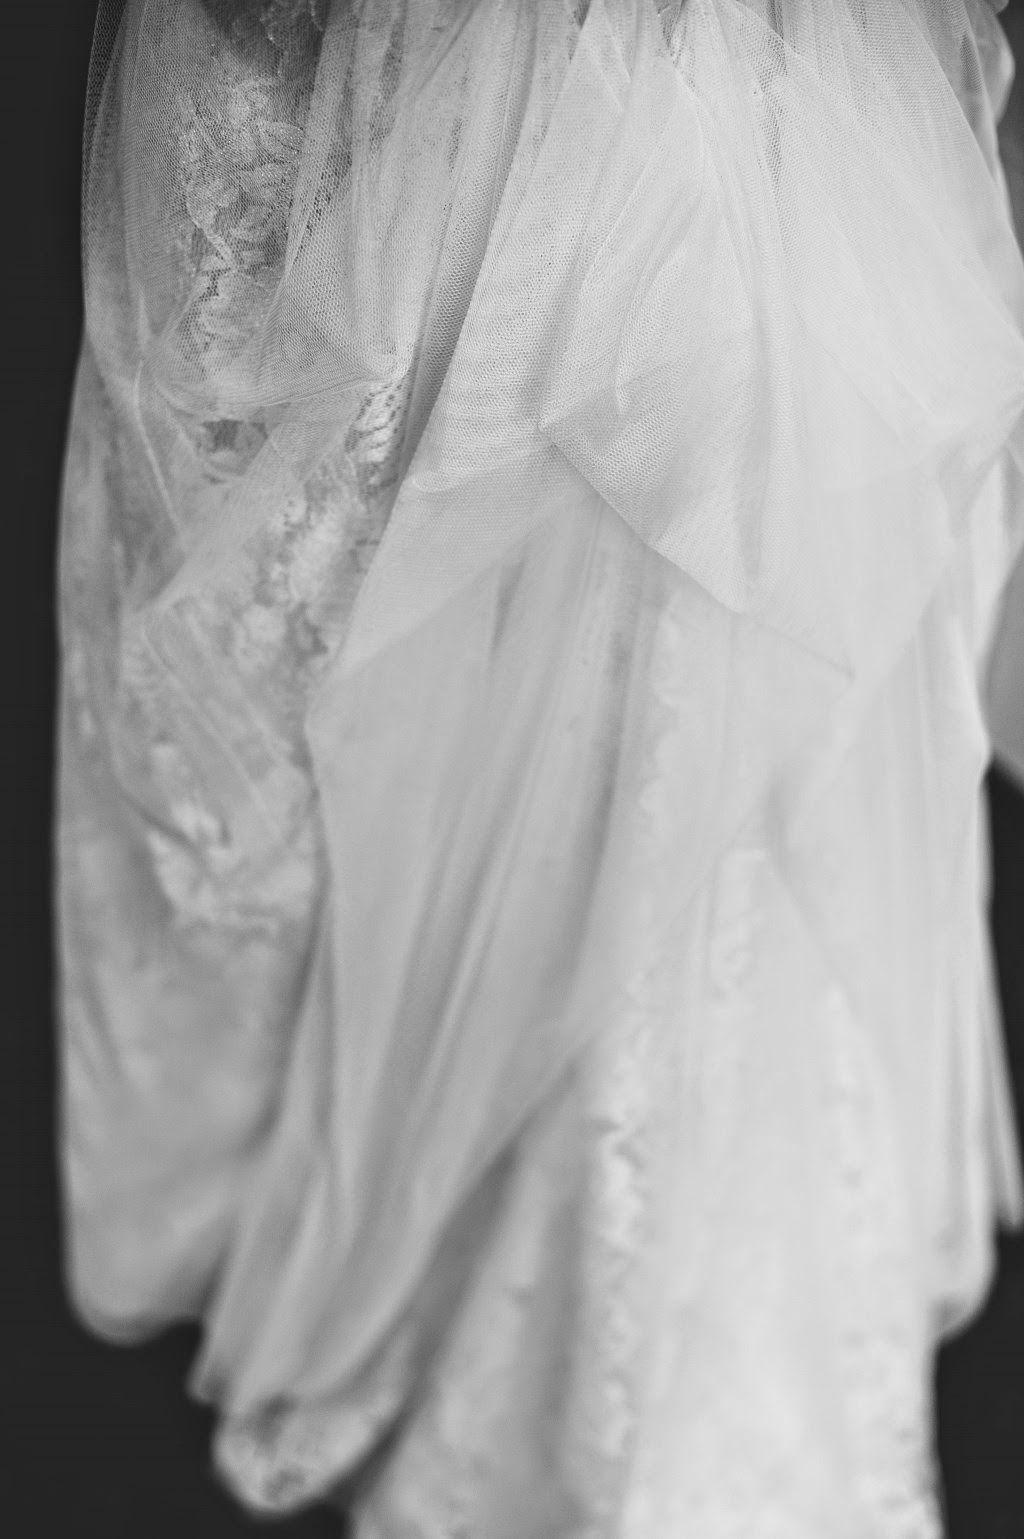 Build your own wedding dress  Natalieus KiraKira weddingdress lacy  wedding  Pinterest  Wedding